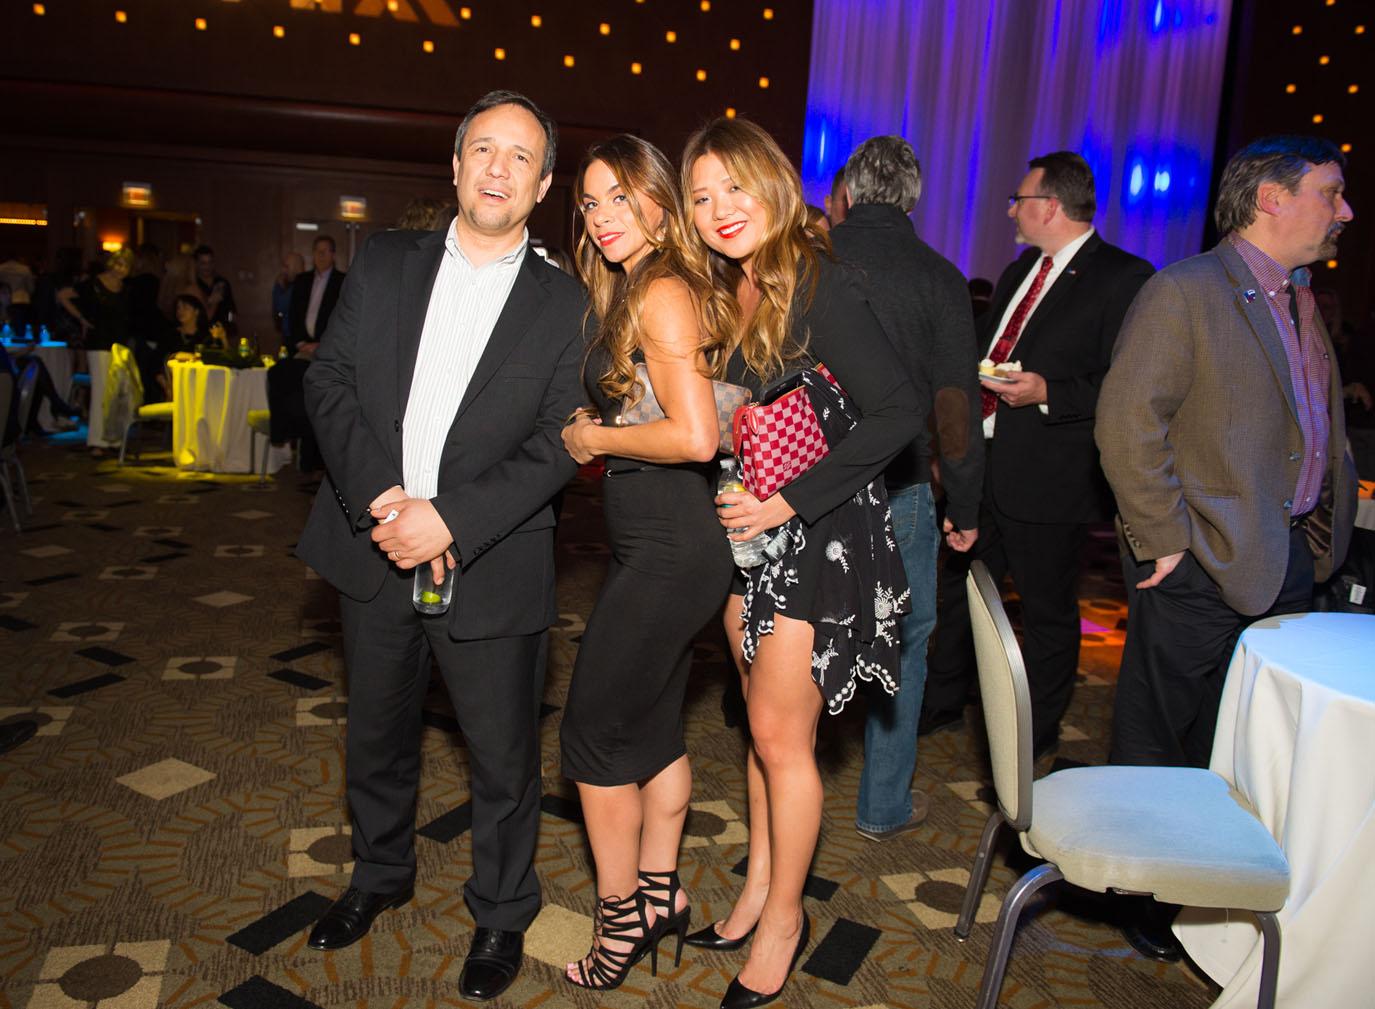 2015-12-09 ReMax Corpoarte Event - The Borgata - Atlantic City NJ - Photo Sesh - 2015-5169.jpg